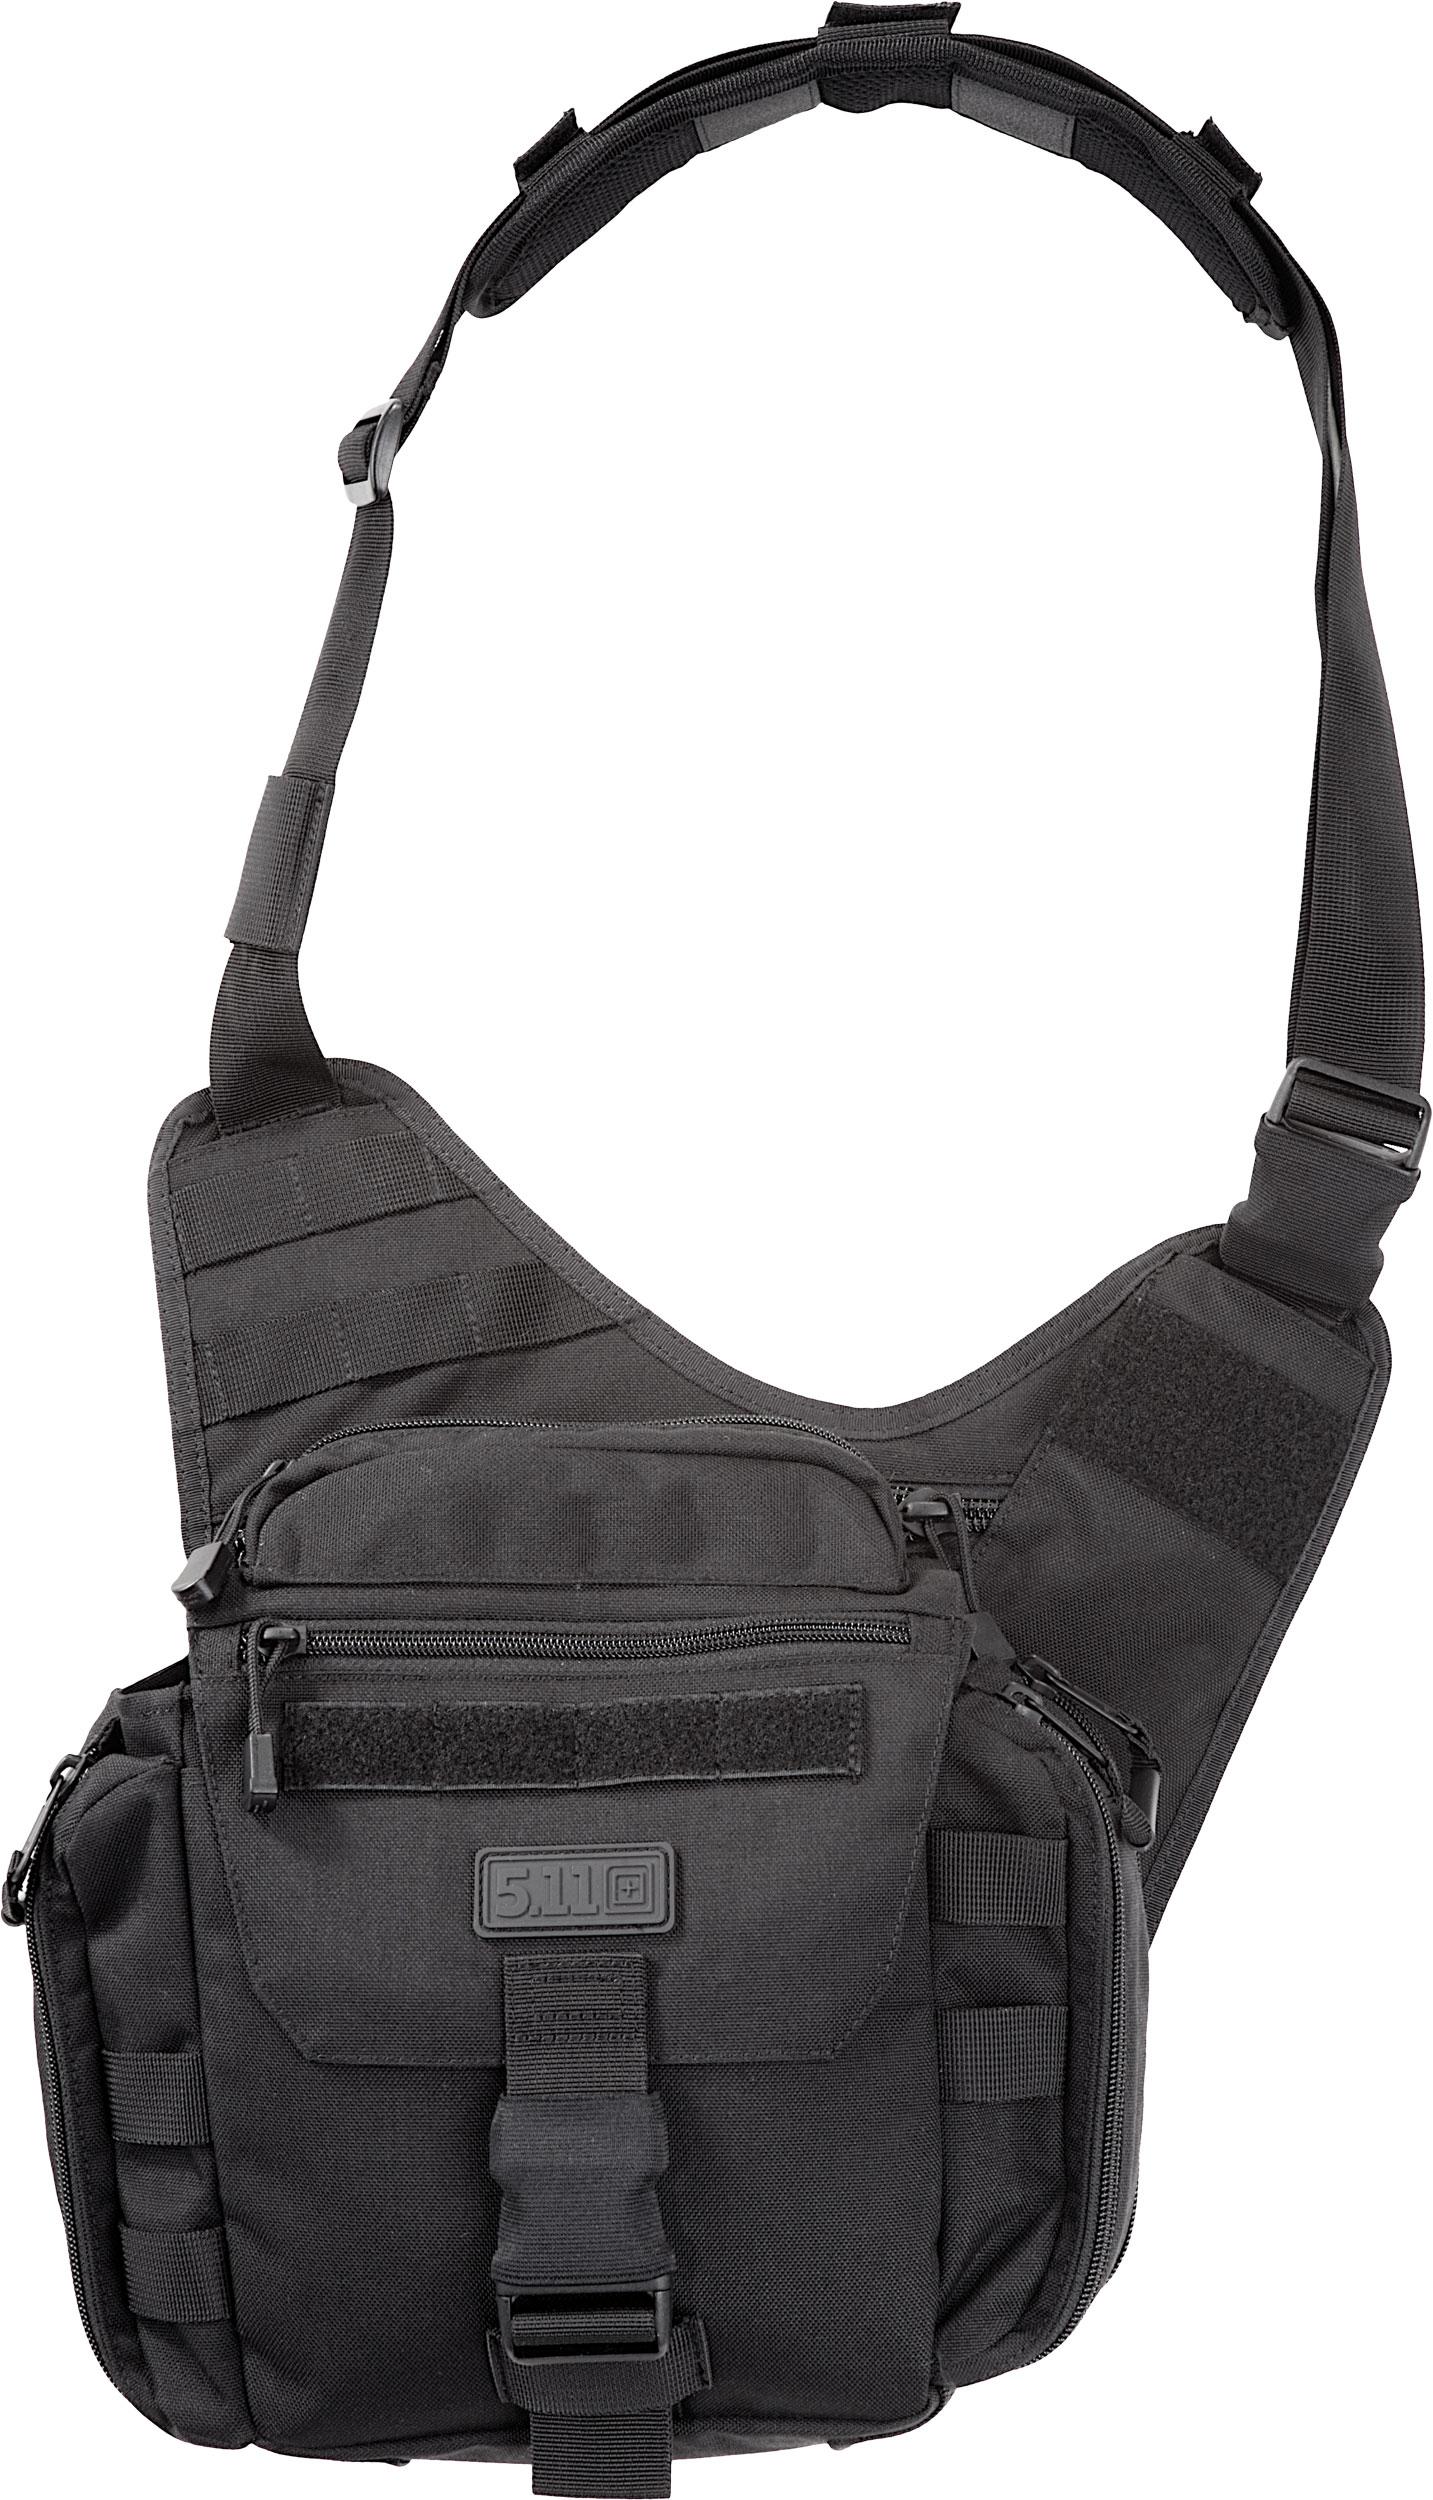 5.11 Tactical PUSH Pack, Black (56037-019)